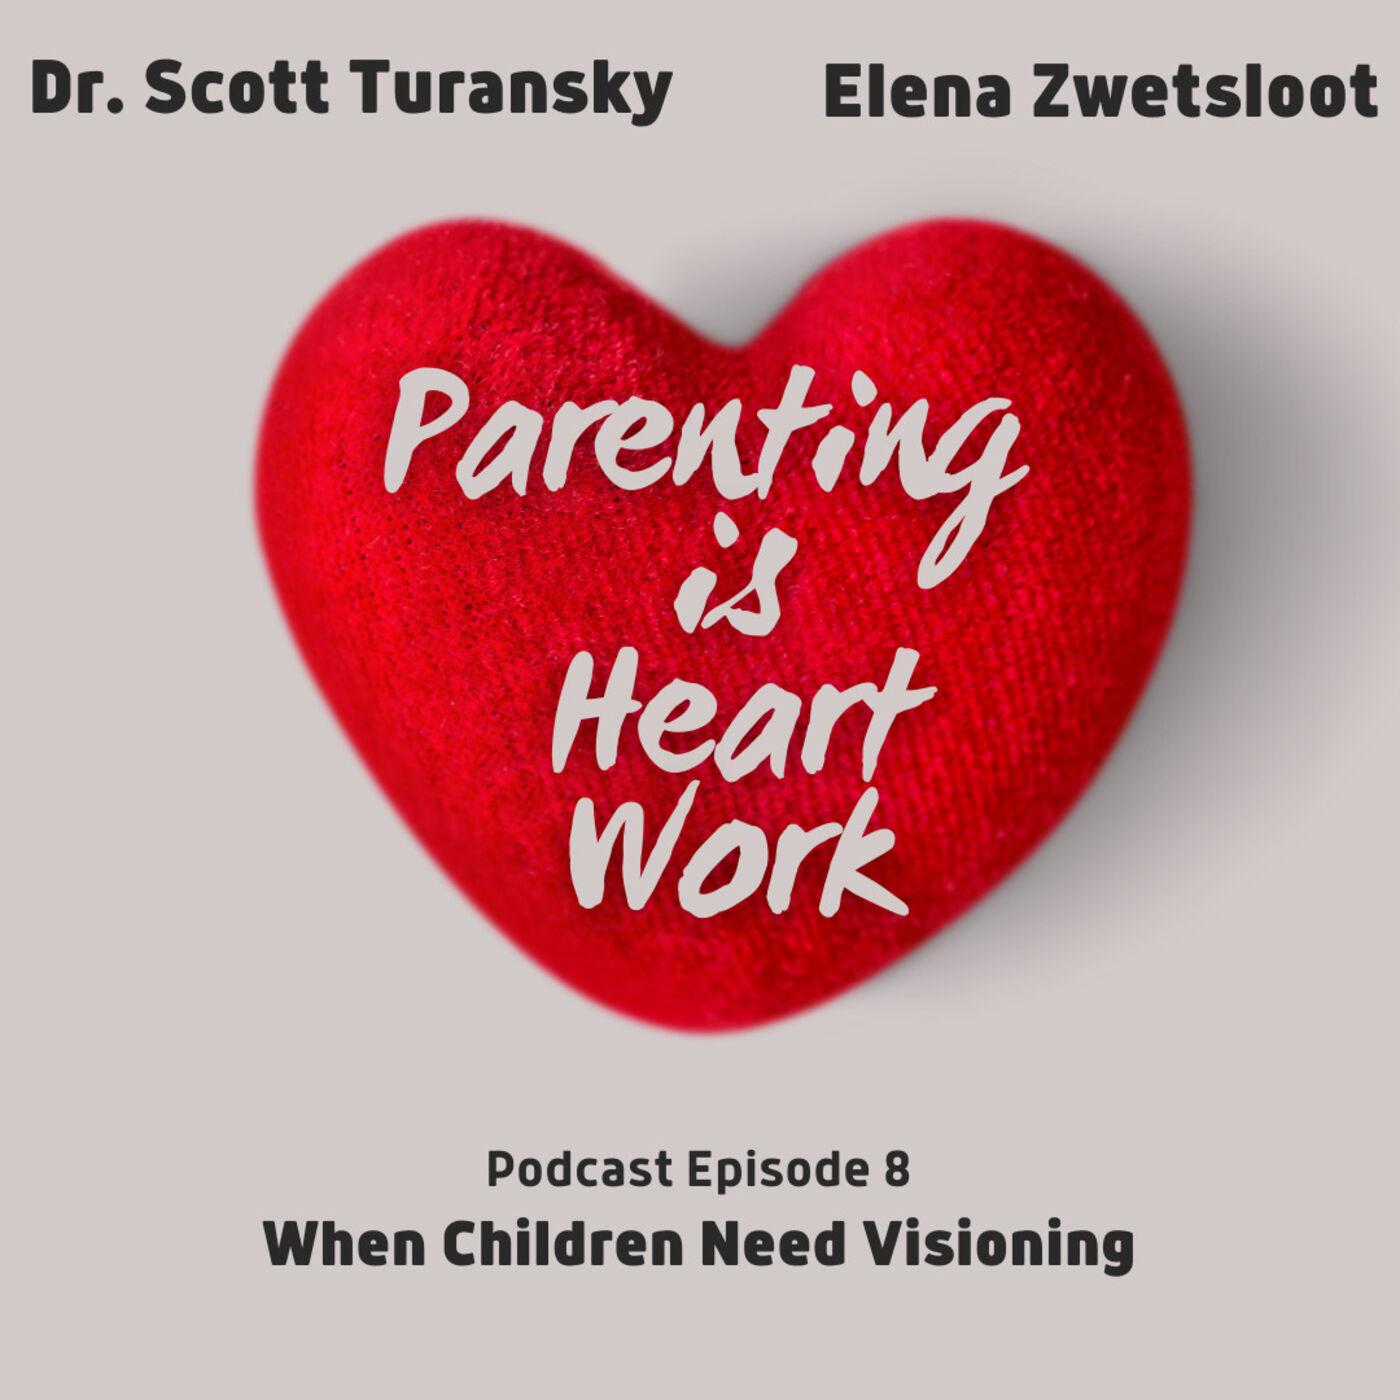 7. When Children Need Visioning